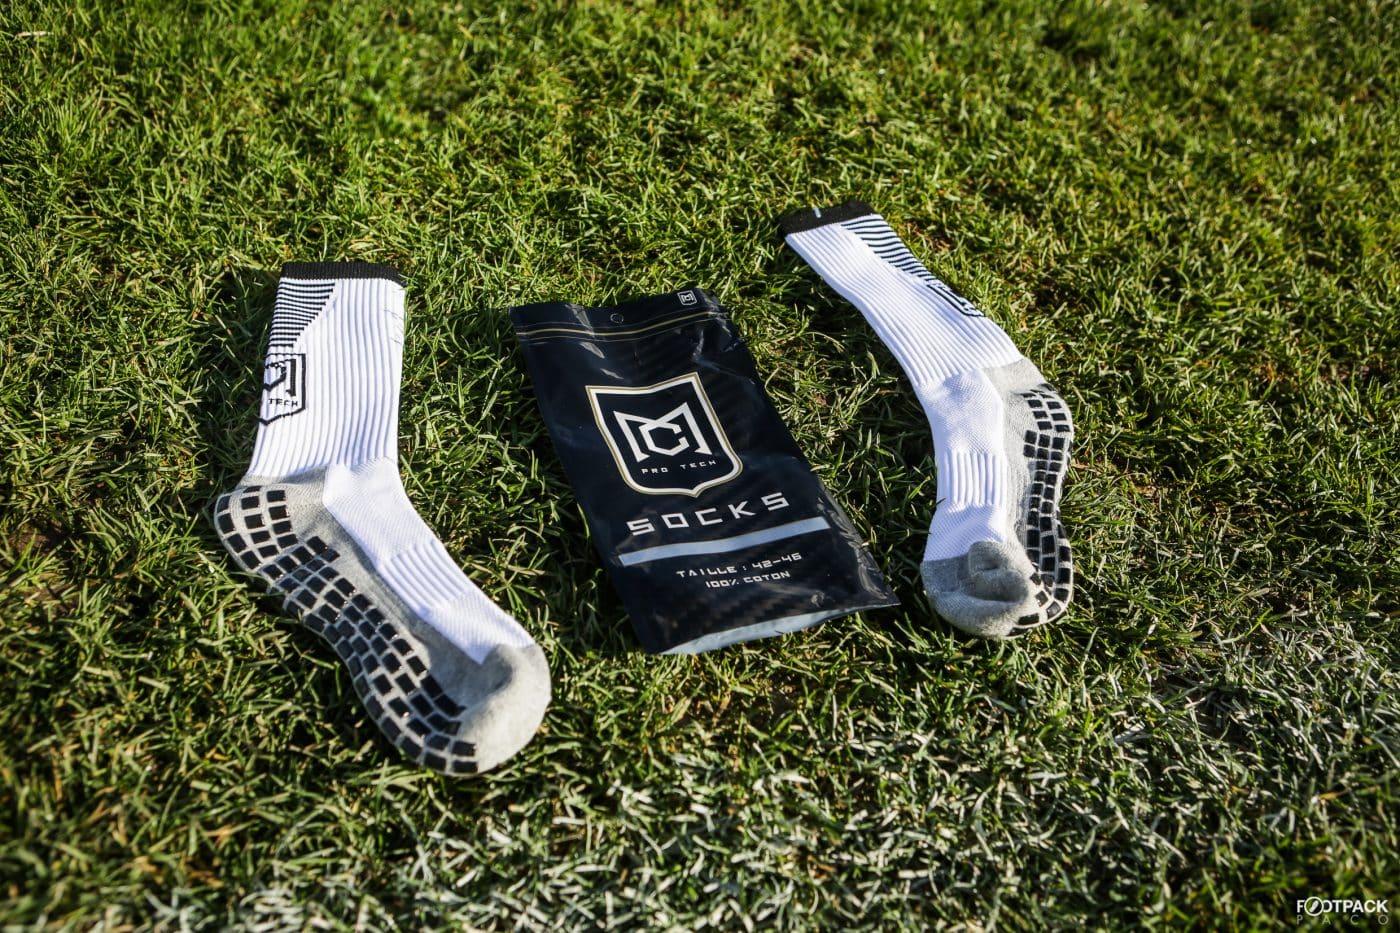 mc-protech-protege-tibias-chaussettes-footpack-3